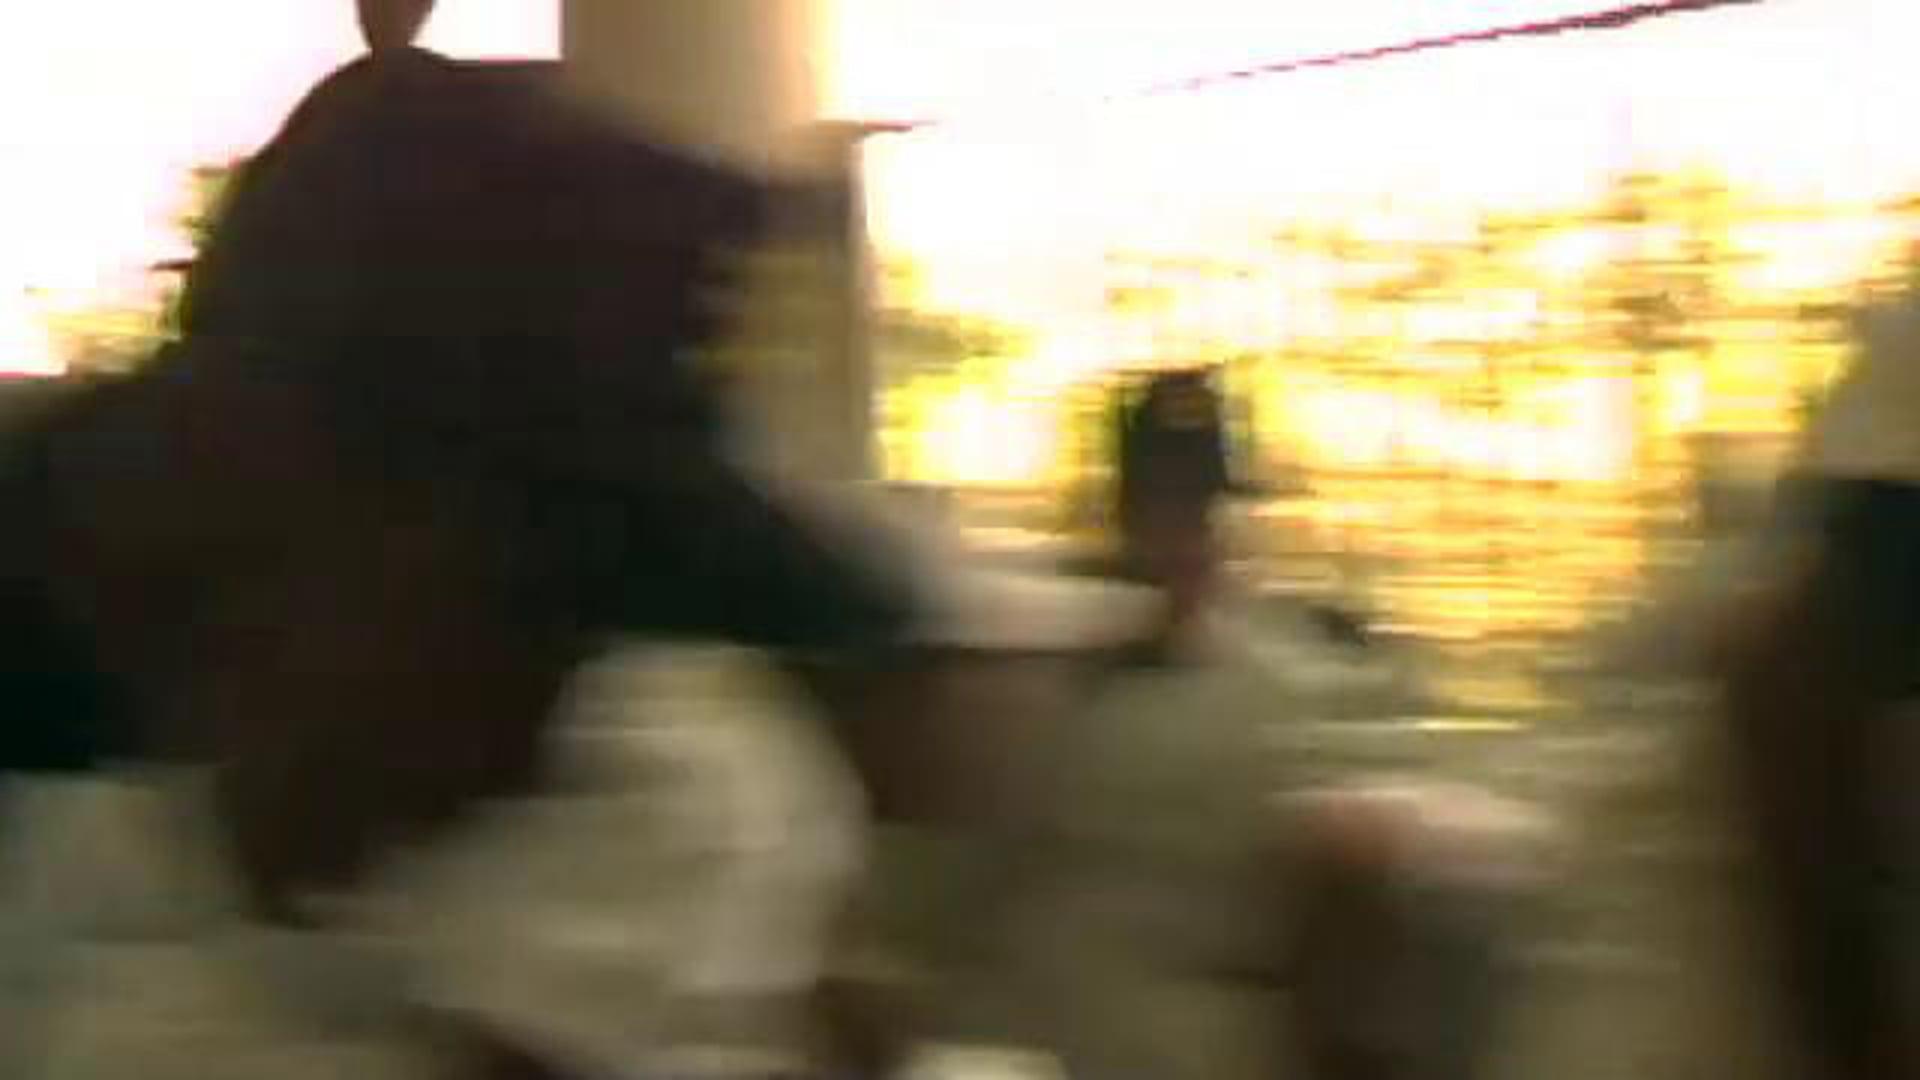 Kokoyakyu: High School Baseball - 3 minute trailer